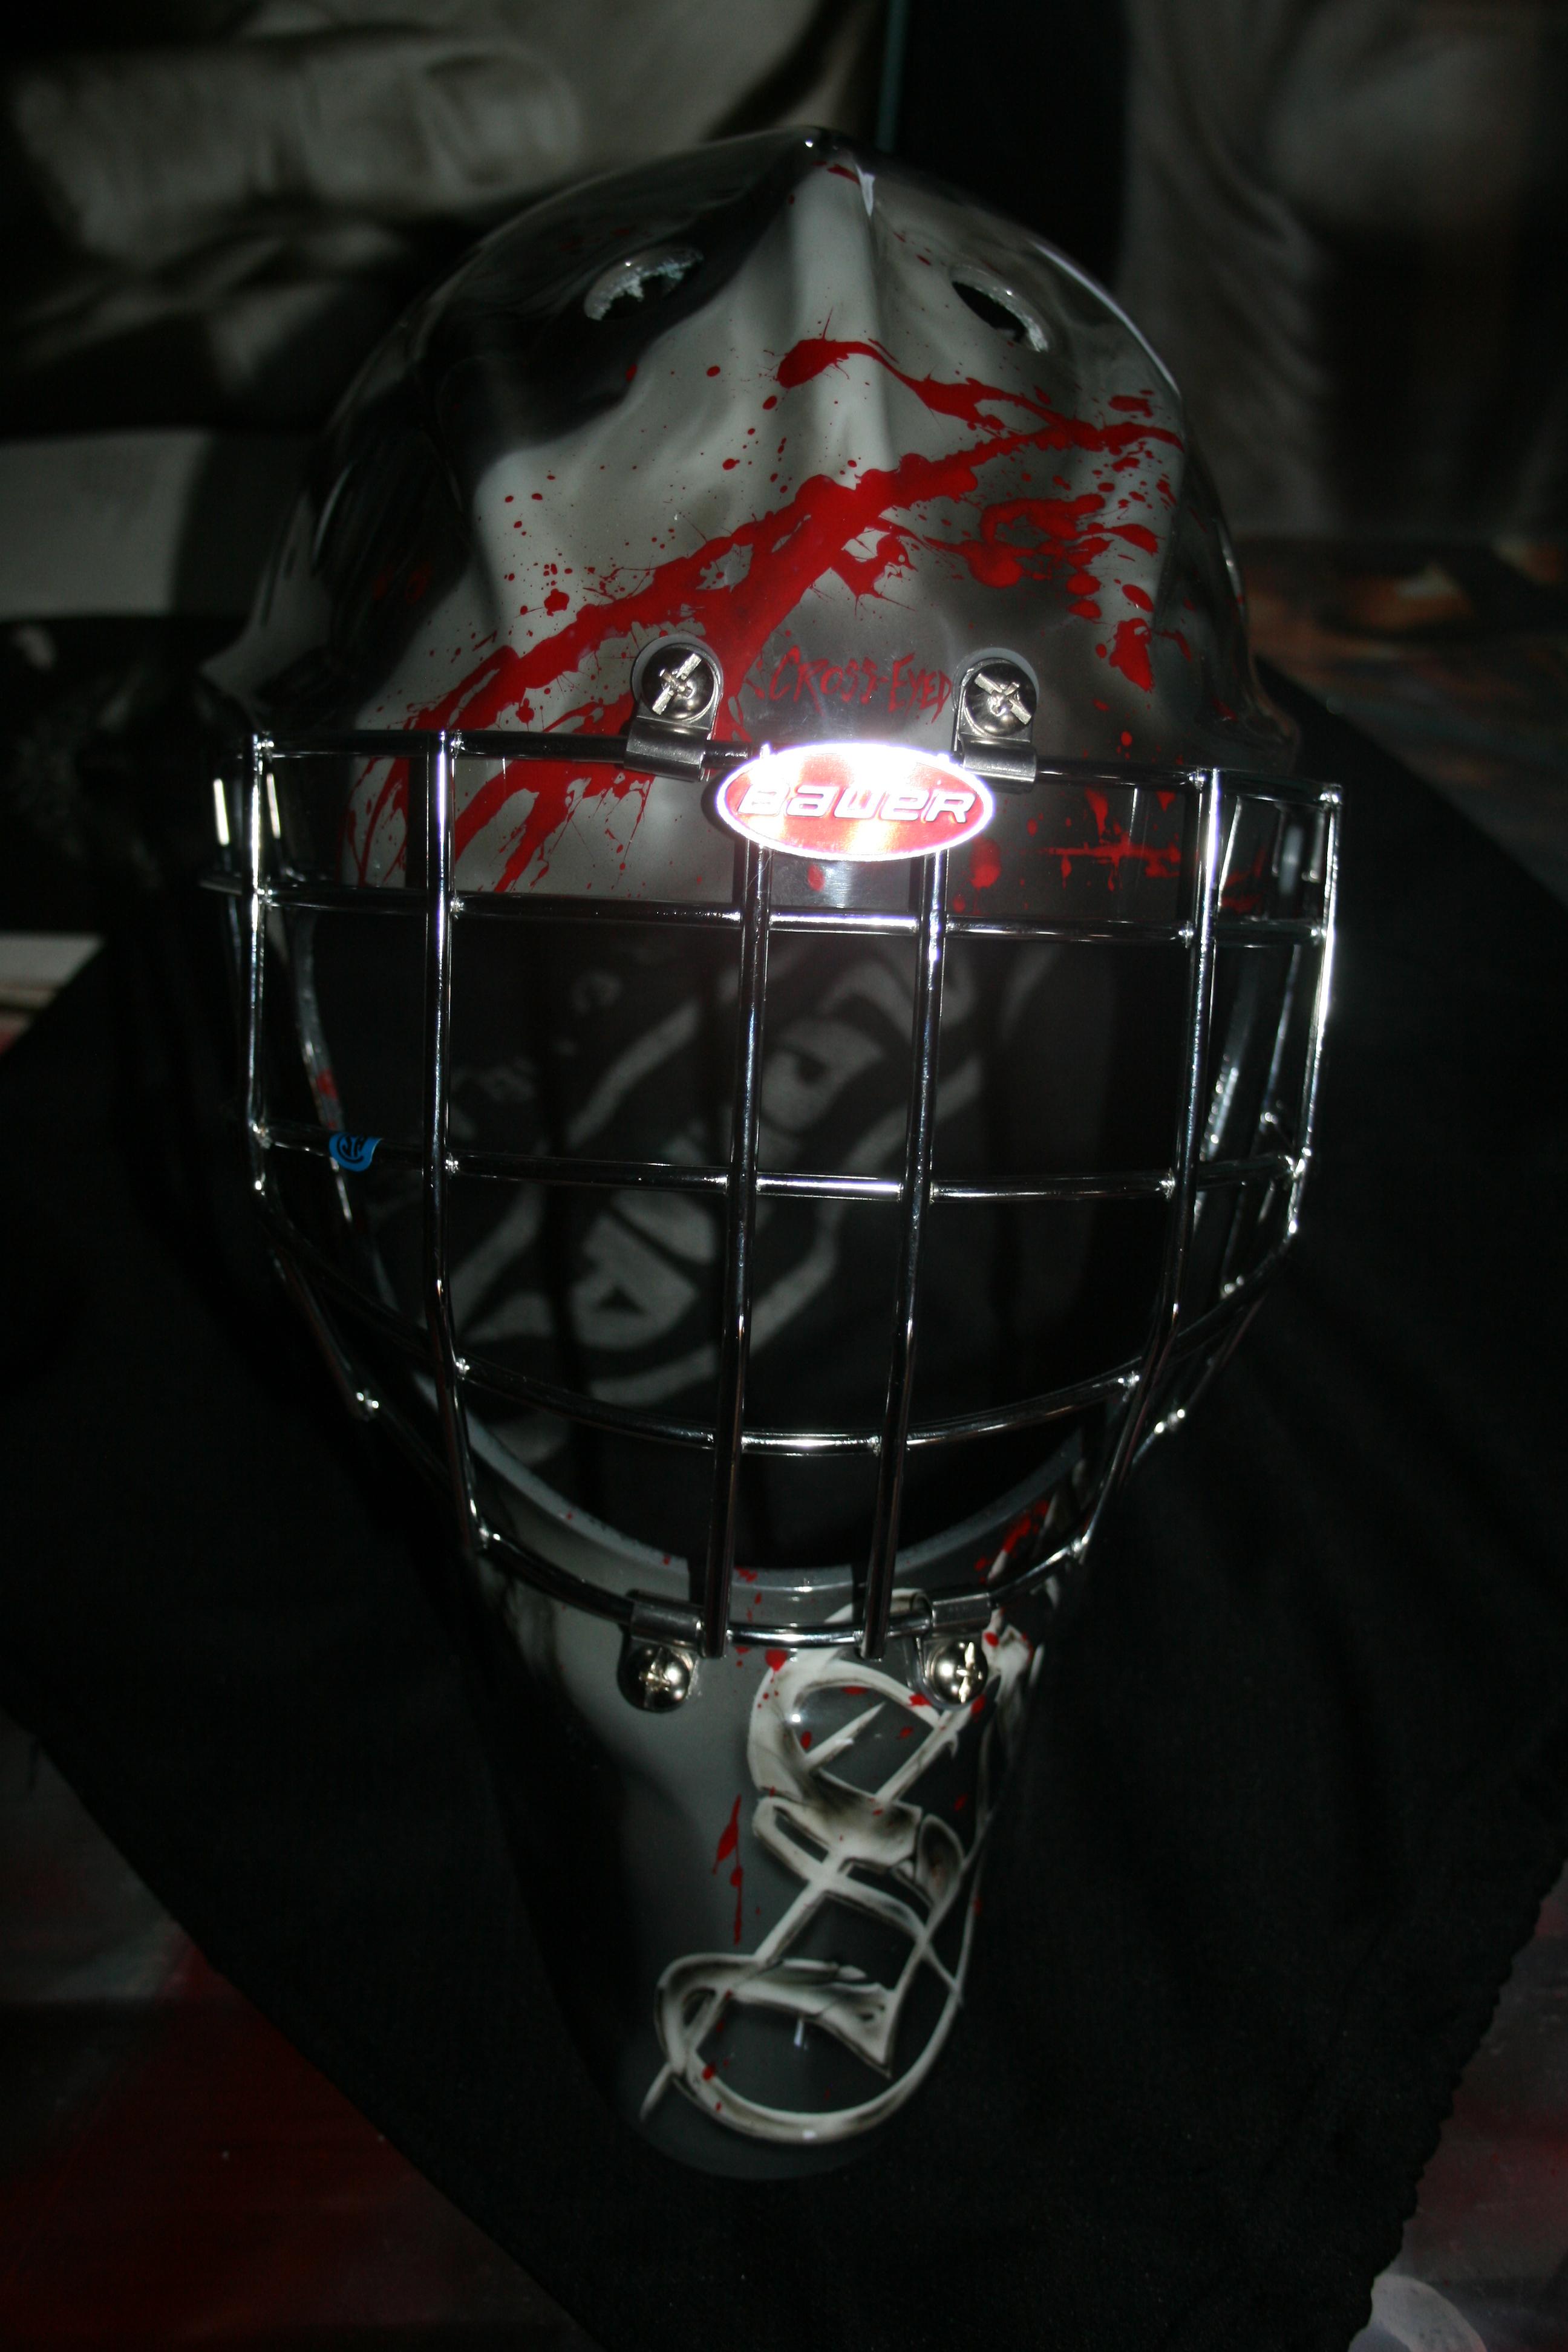 Snider Calgary Hitmen 0